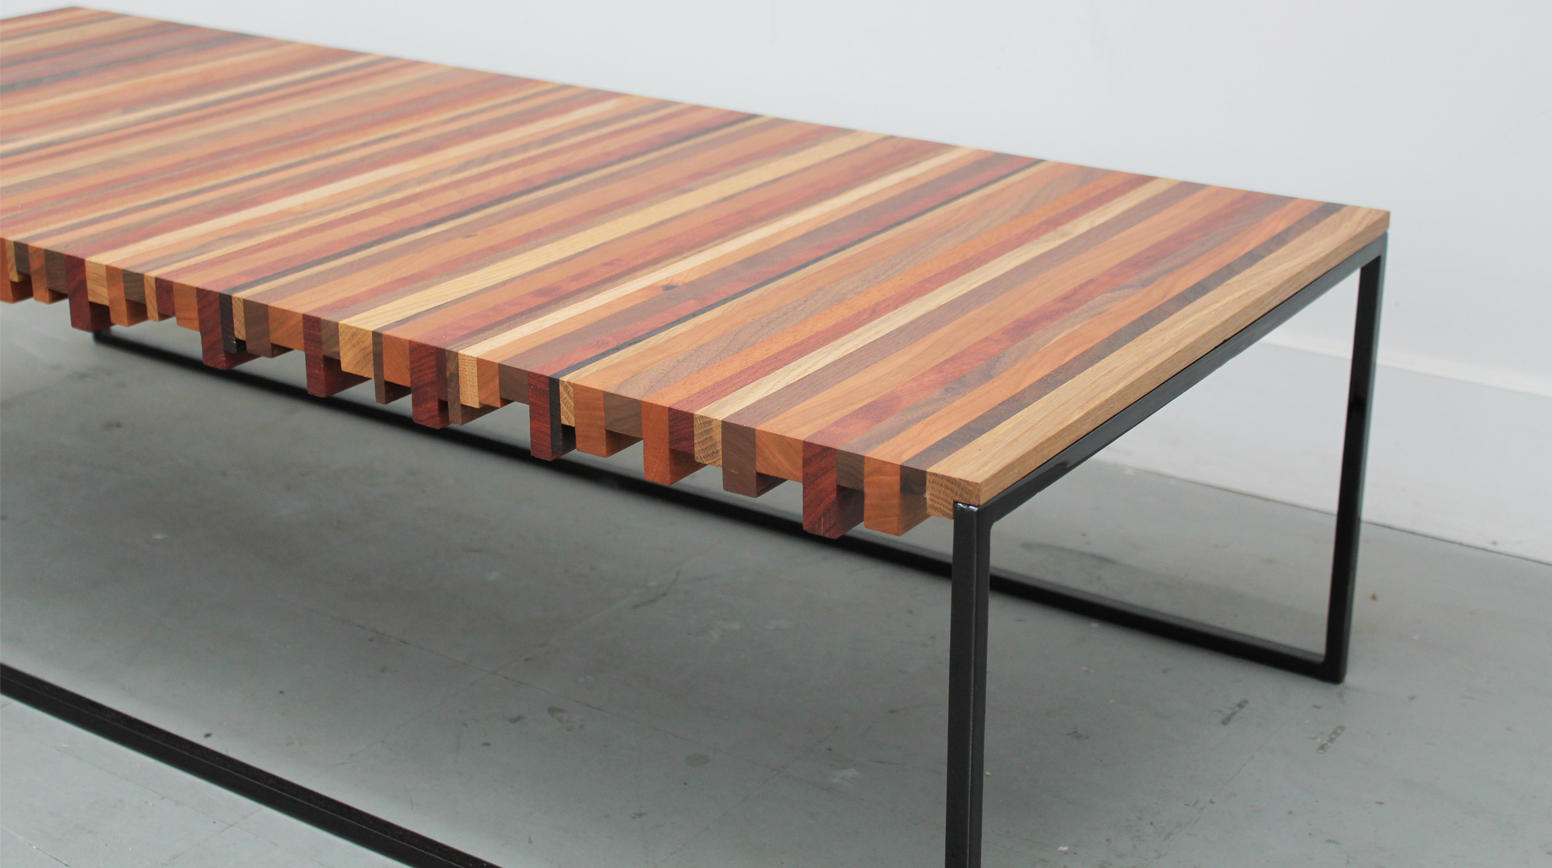 ... Striper Coffee Table by Uhuru Design | Coffee tables ... & STRIPER COFFEE TABLE - Coffee tables from Uhuru Design | Architonic